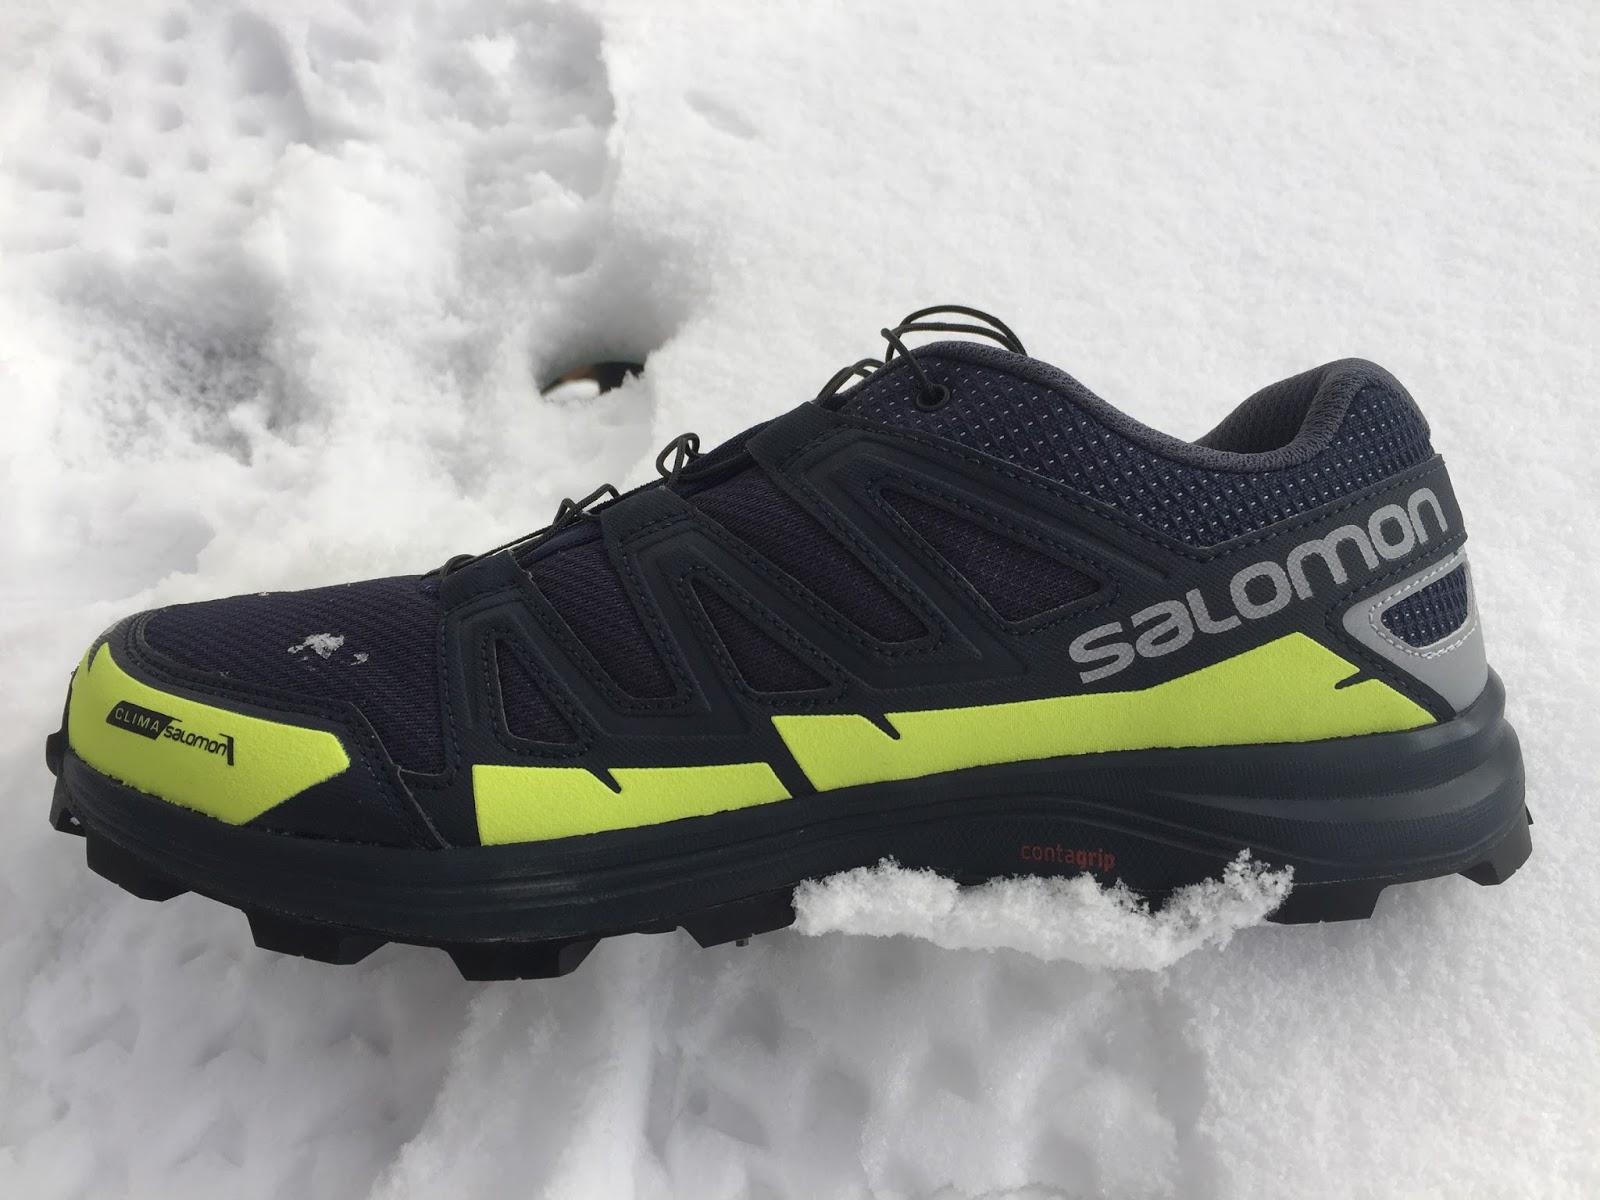 Road Trail Run: Salomon Speedspike CS Review: For gnarly